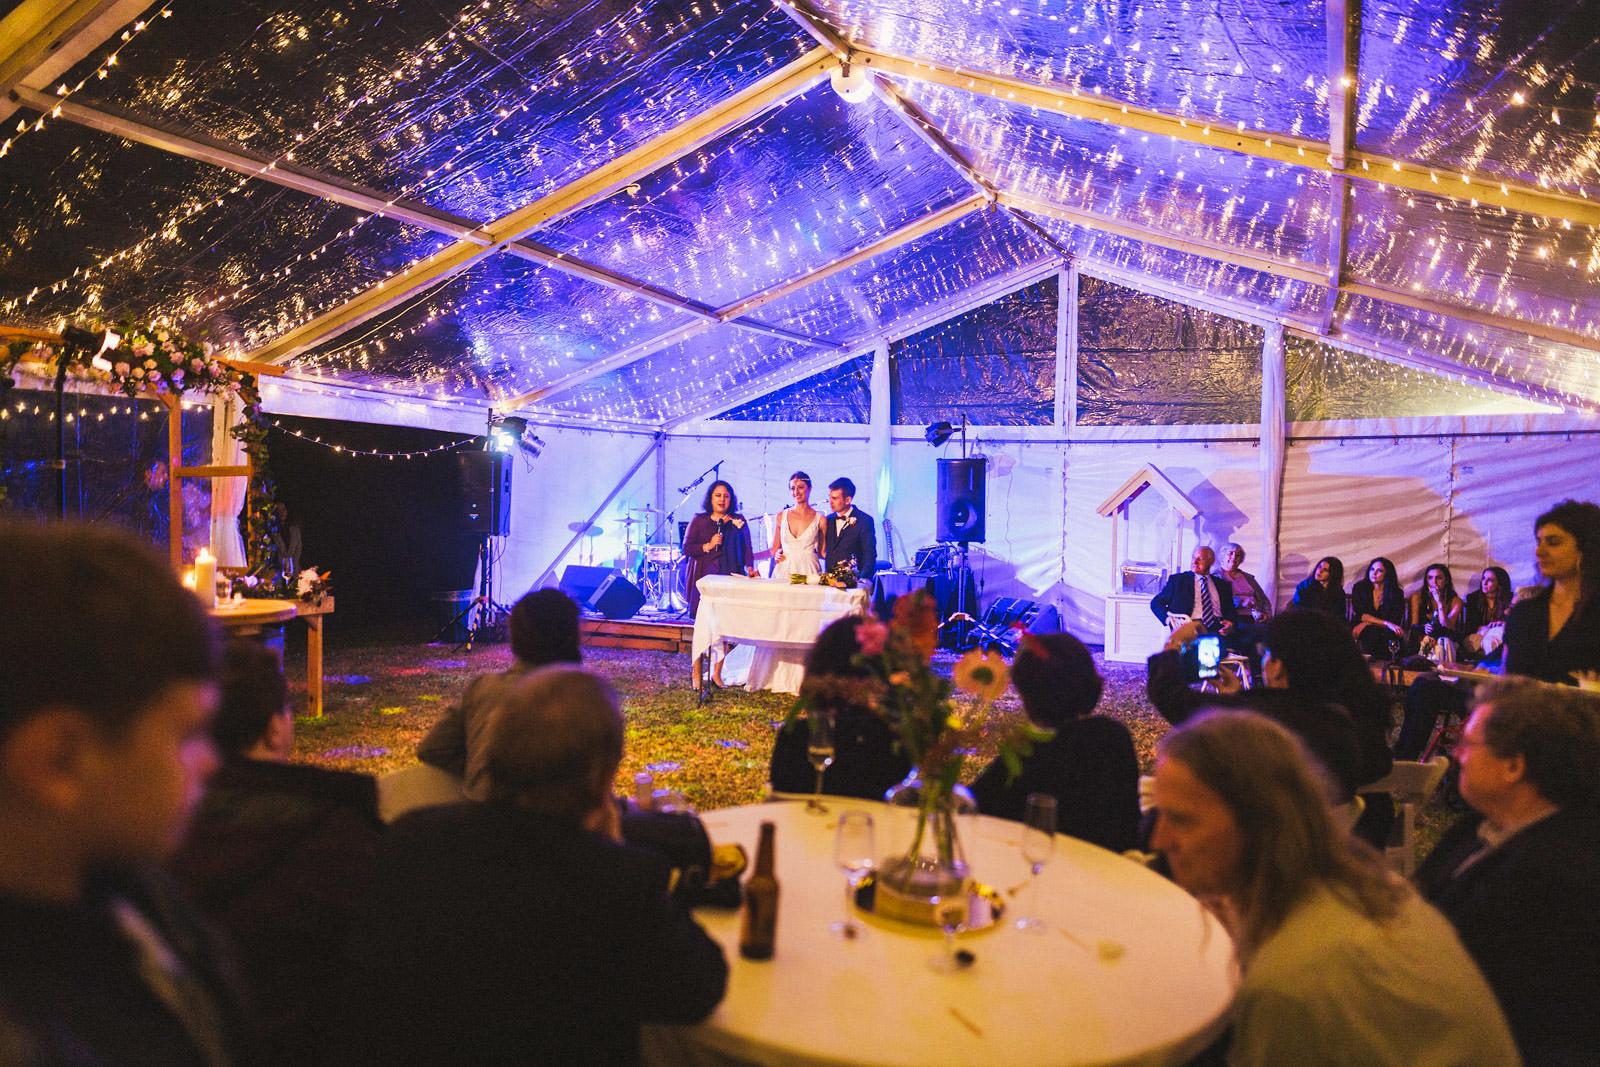 tablelands_wedding_0056